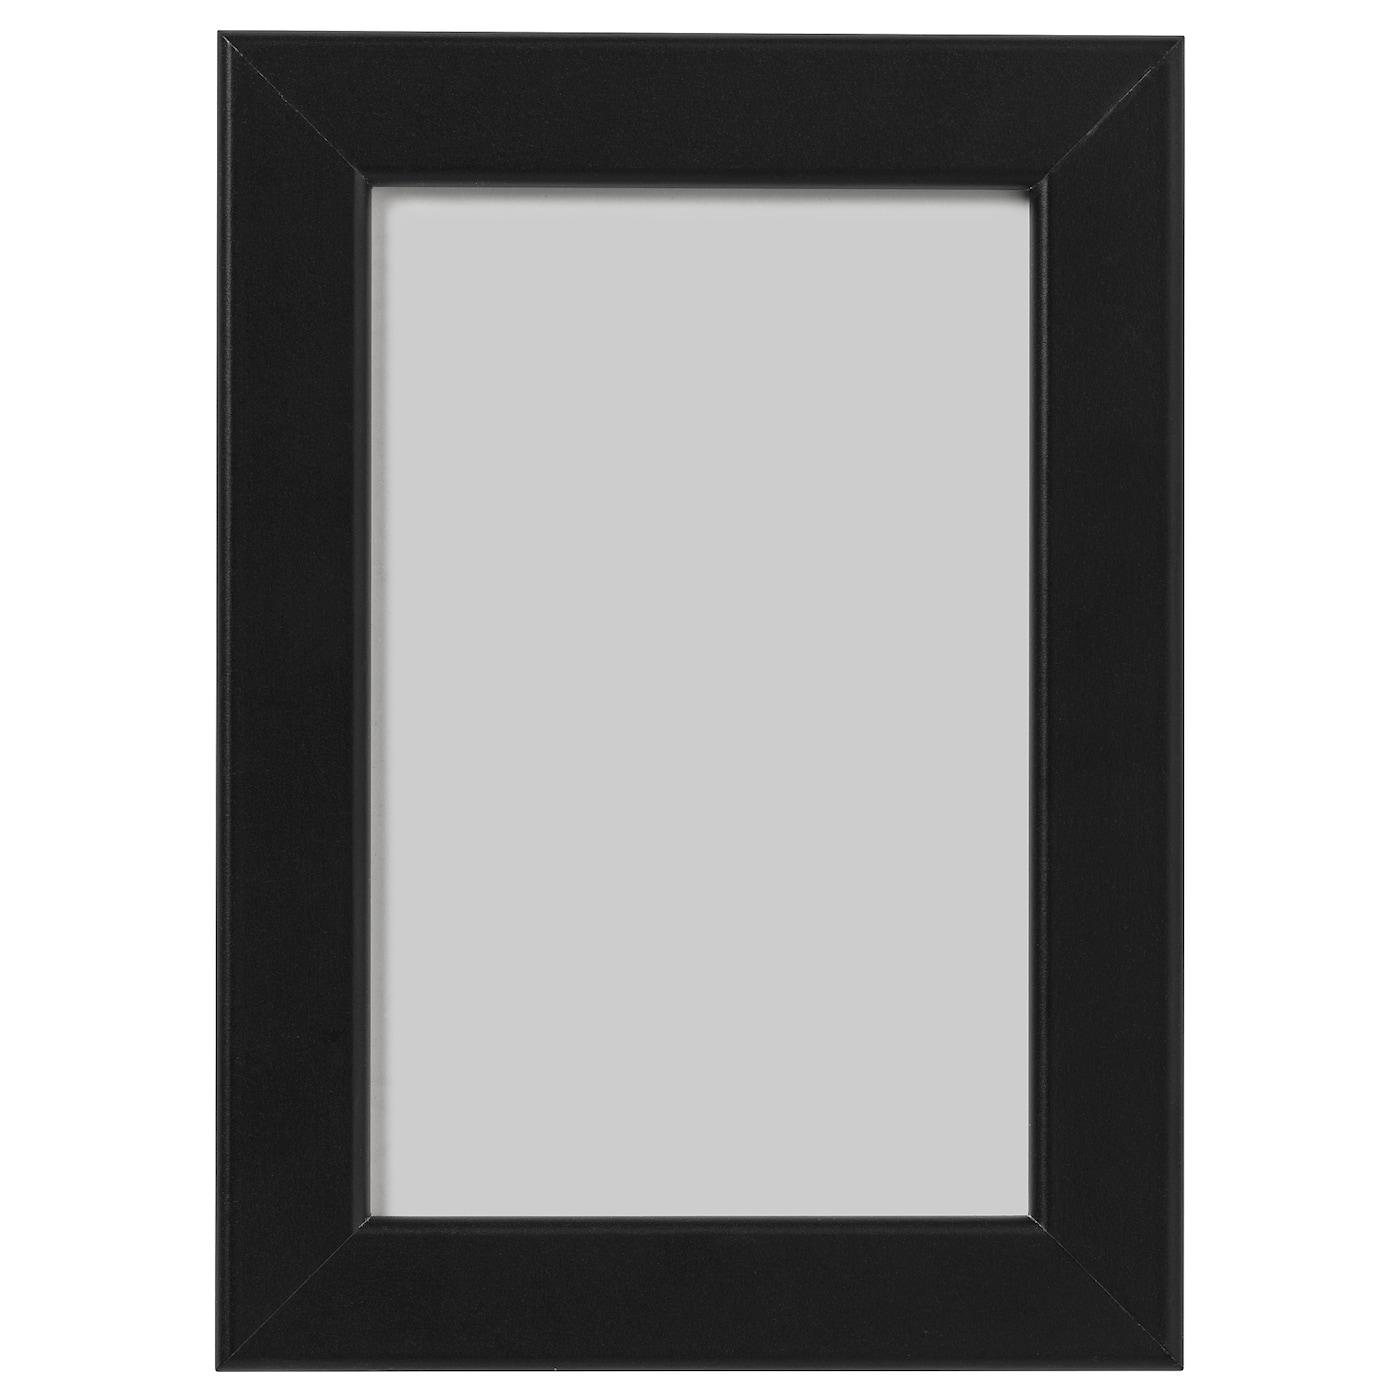 kaders en posters decoratie ikea. Black Bedroom Furniture Sets. Home Design Ideas